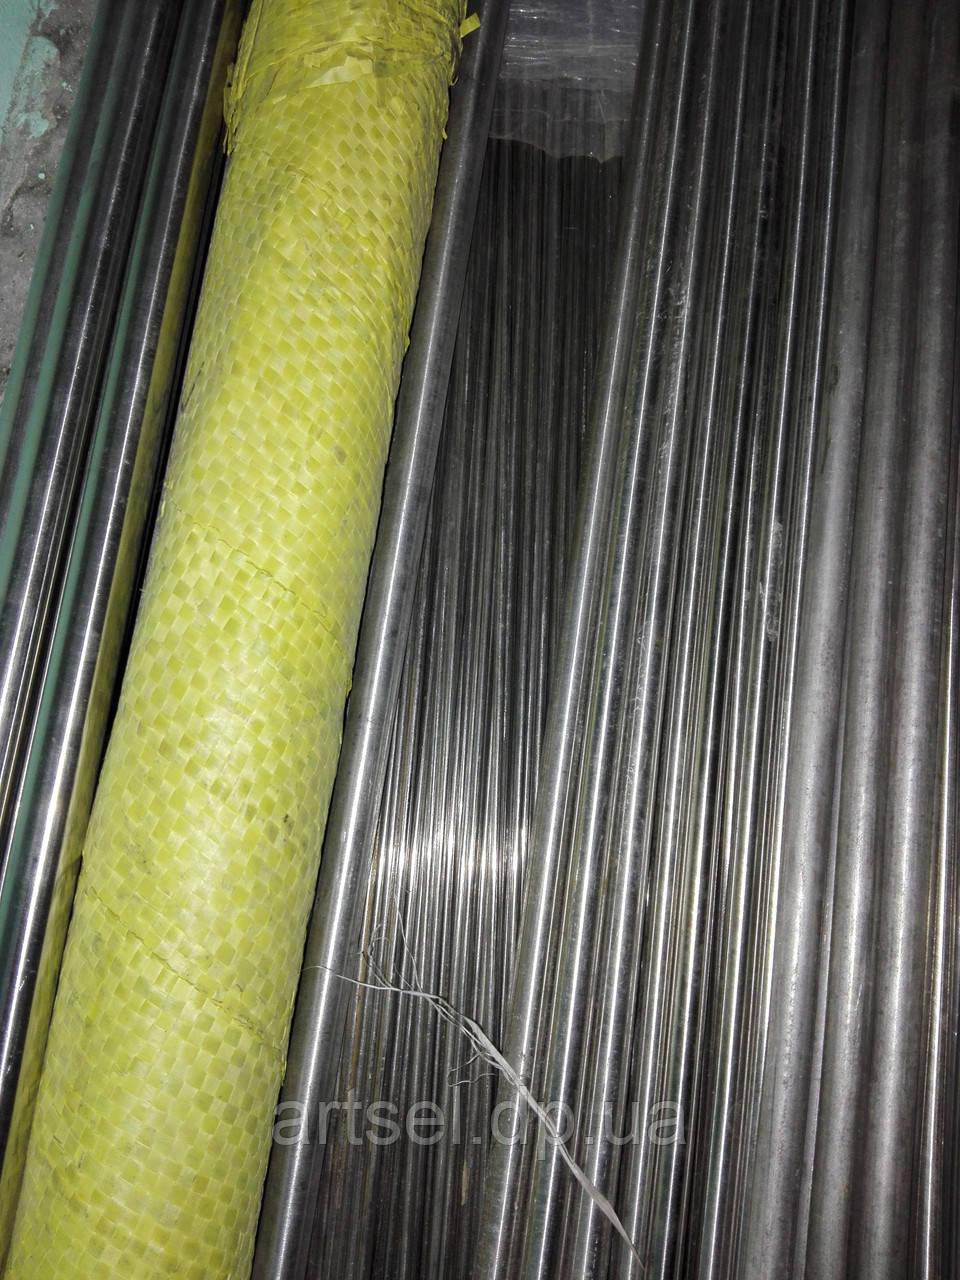 Круг нержавеющий 3 мм 201 калибр